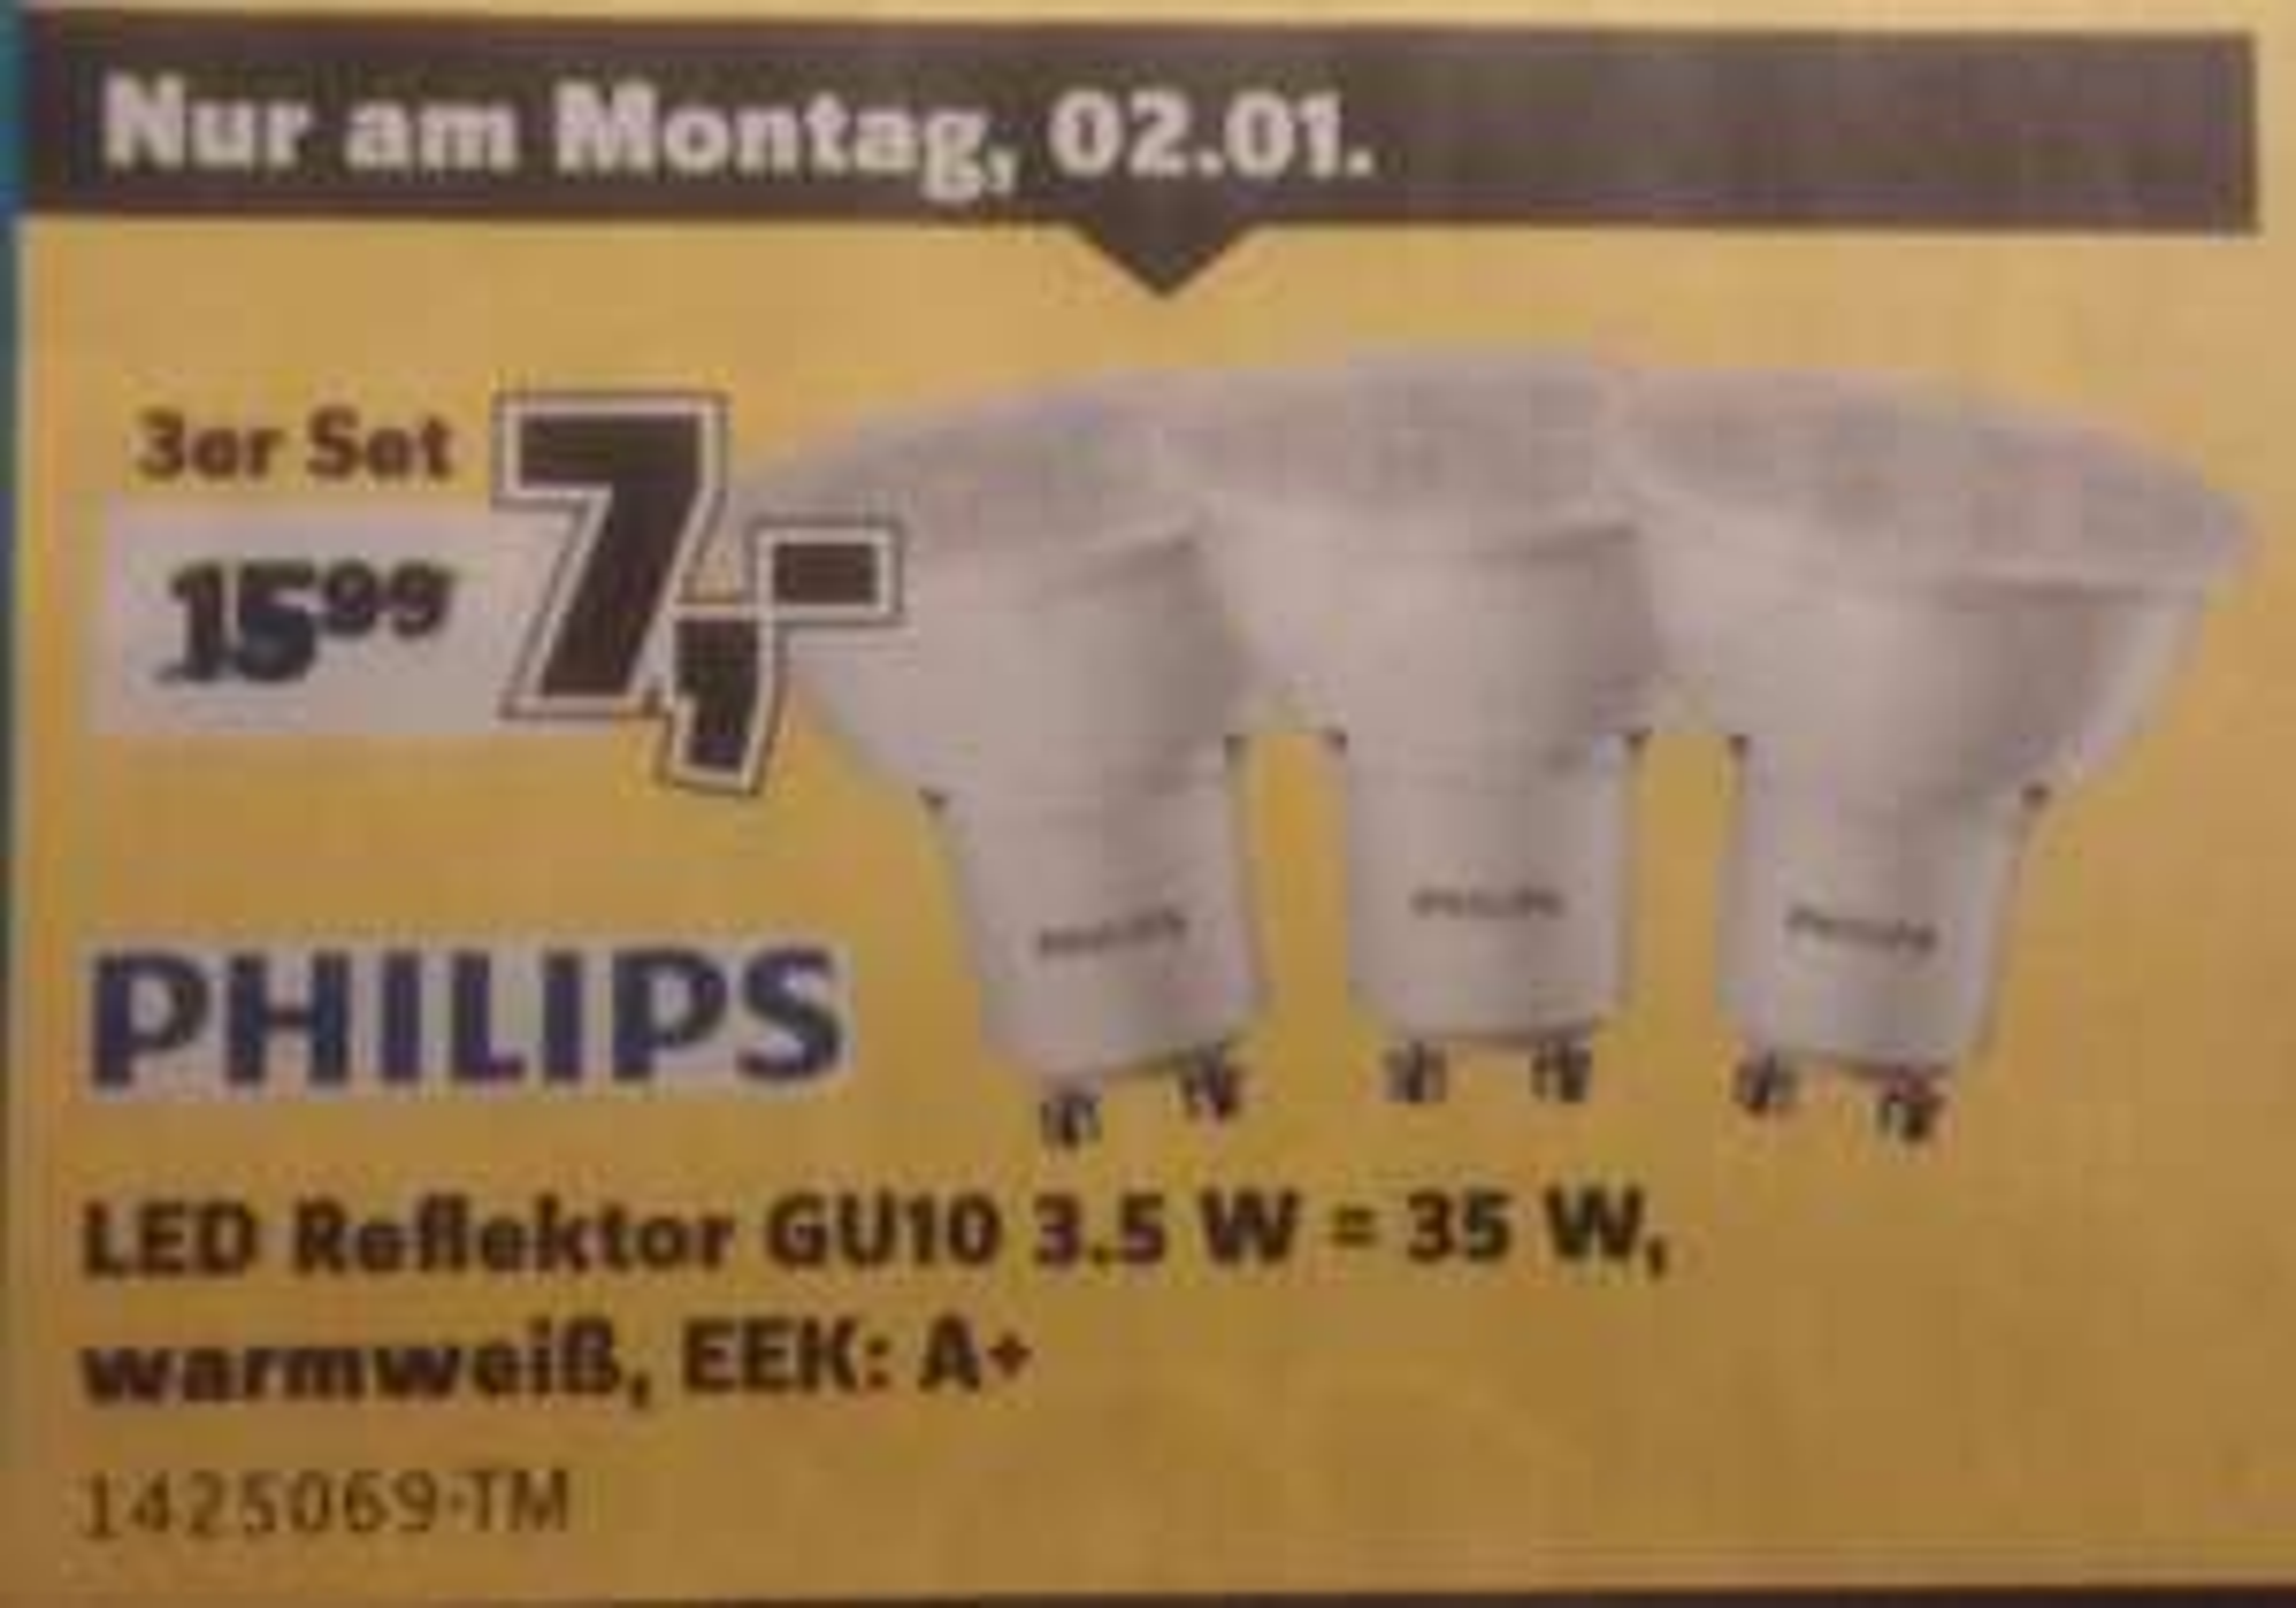 [Conrad bundesweit] 3er Pack Philips LED Reflektor GU10 3.5 W = 35 W, warmweiß, EEK: A+